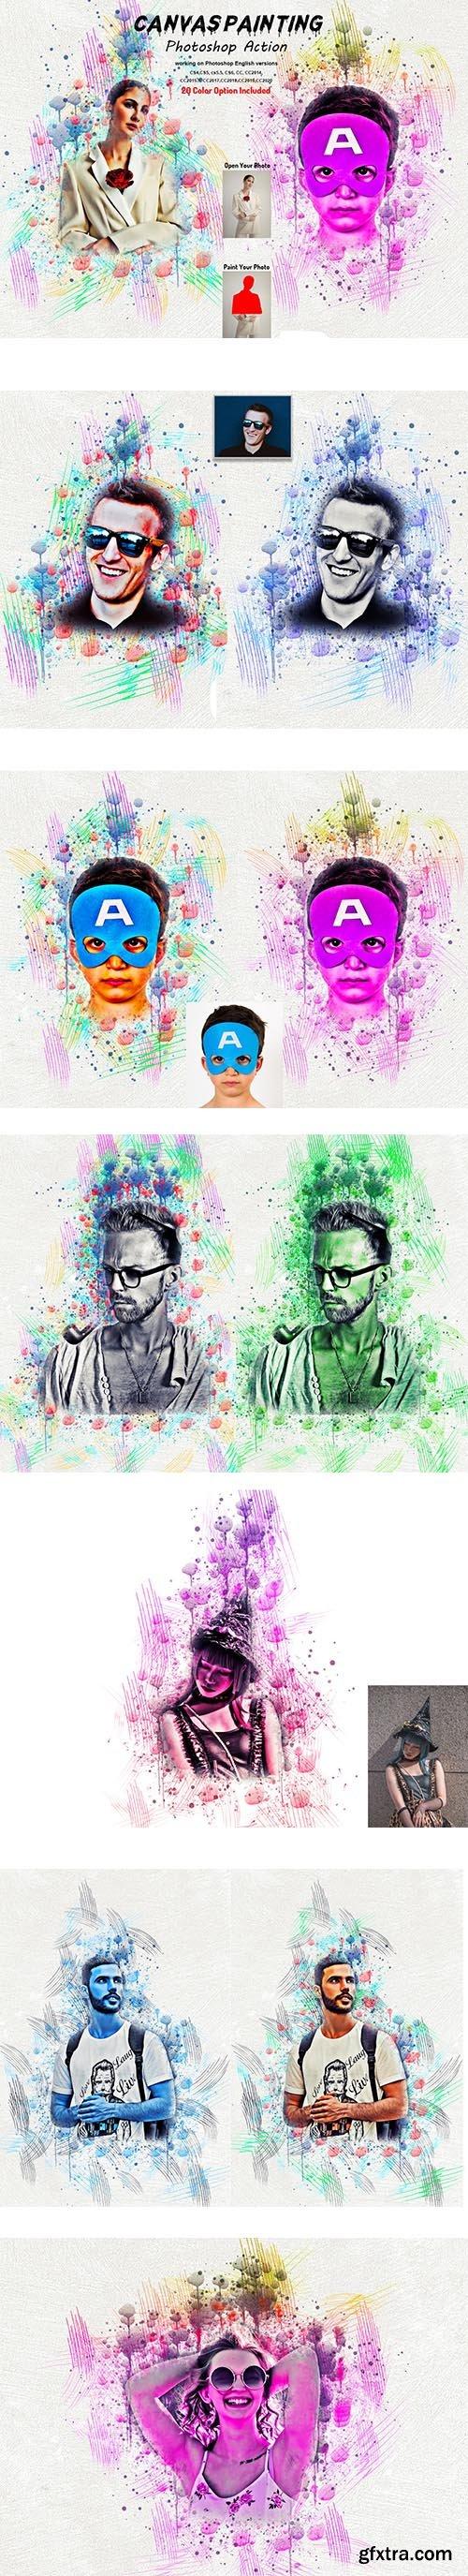 CreativeMarket - Canvas Painting Photoshop Action 5804650